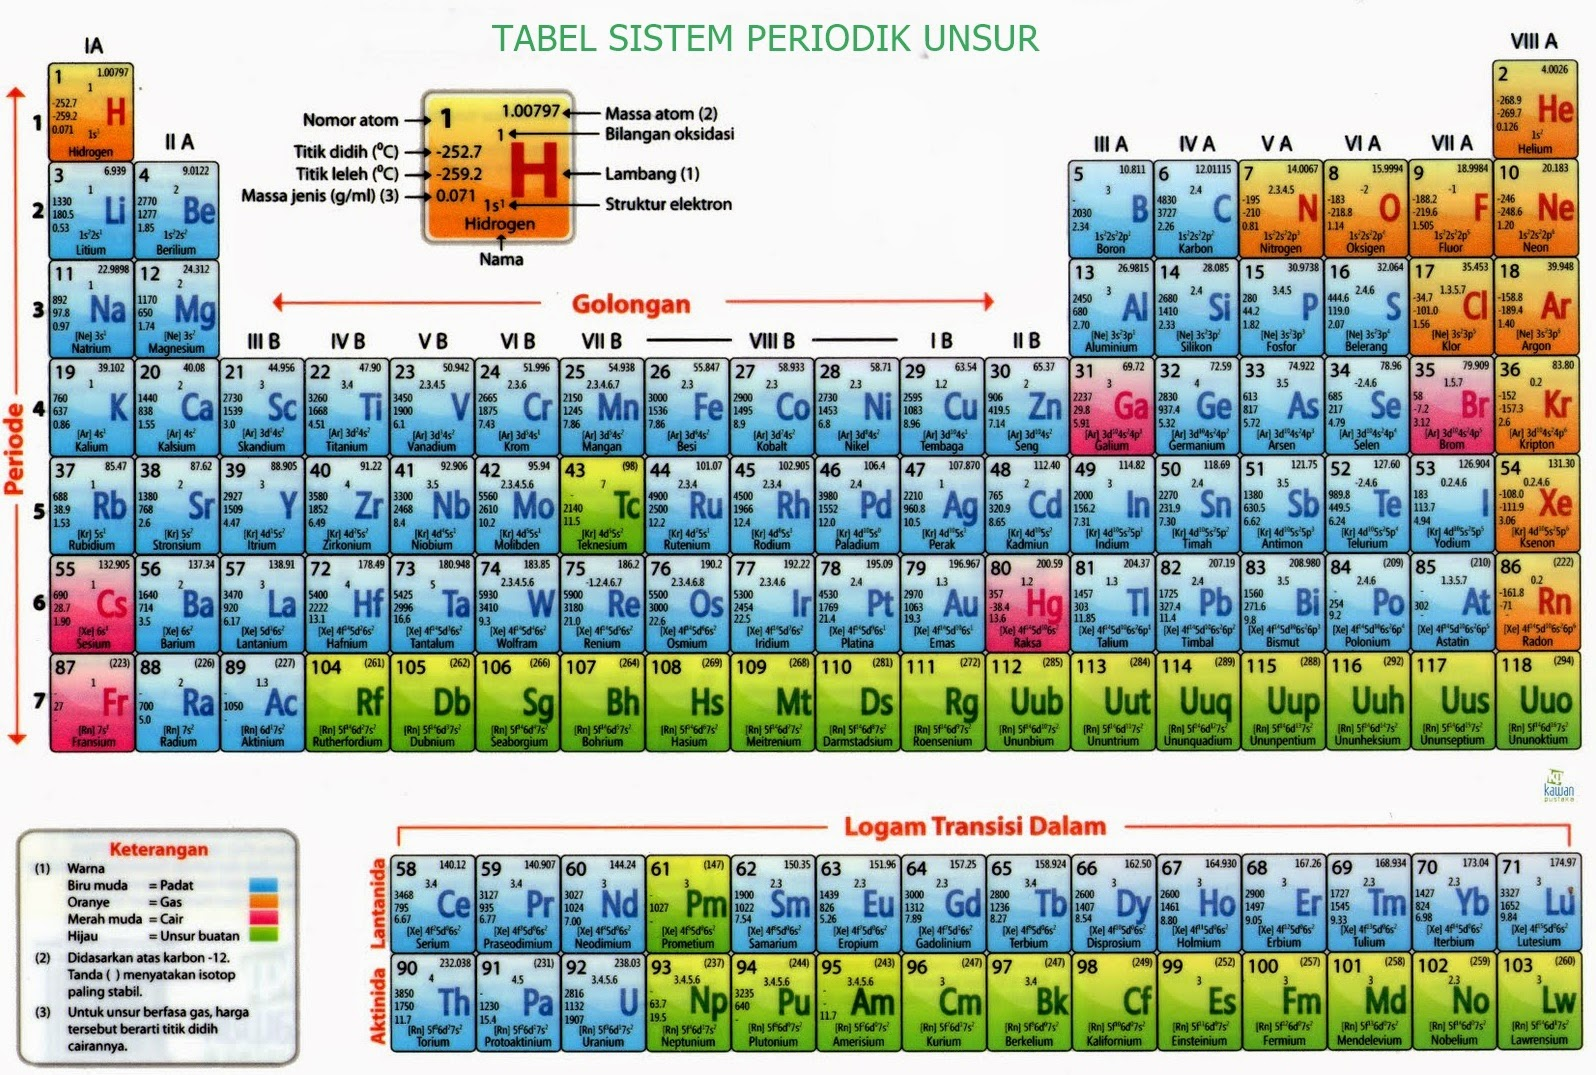 Tabel sistem periodik unsur dan penjelasannya lengkap tabel sistem periodik unsur dan penjelasannya lengkap urtaz Gallery